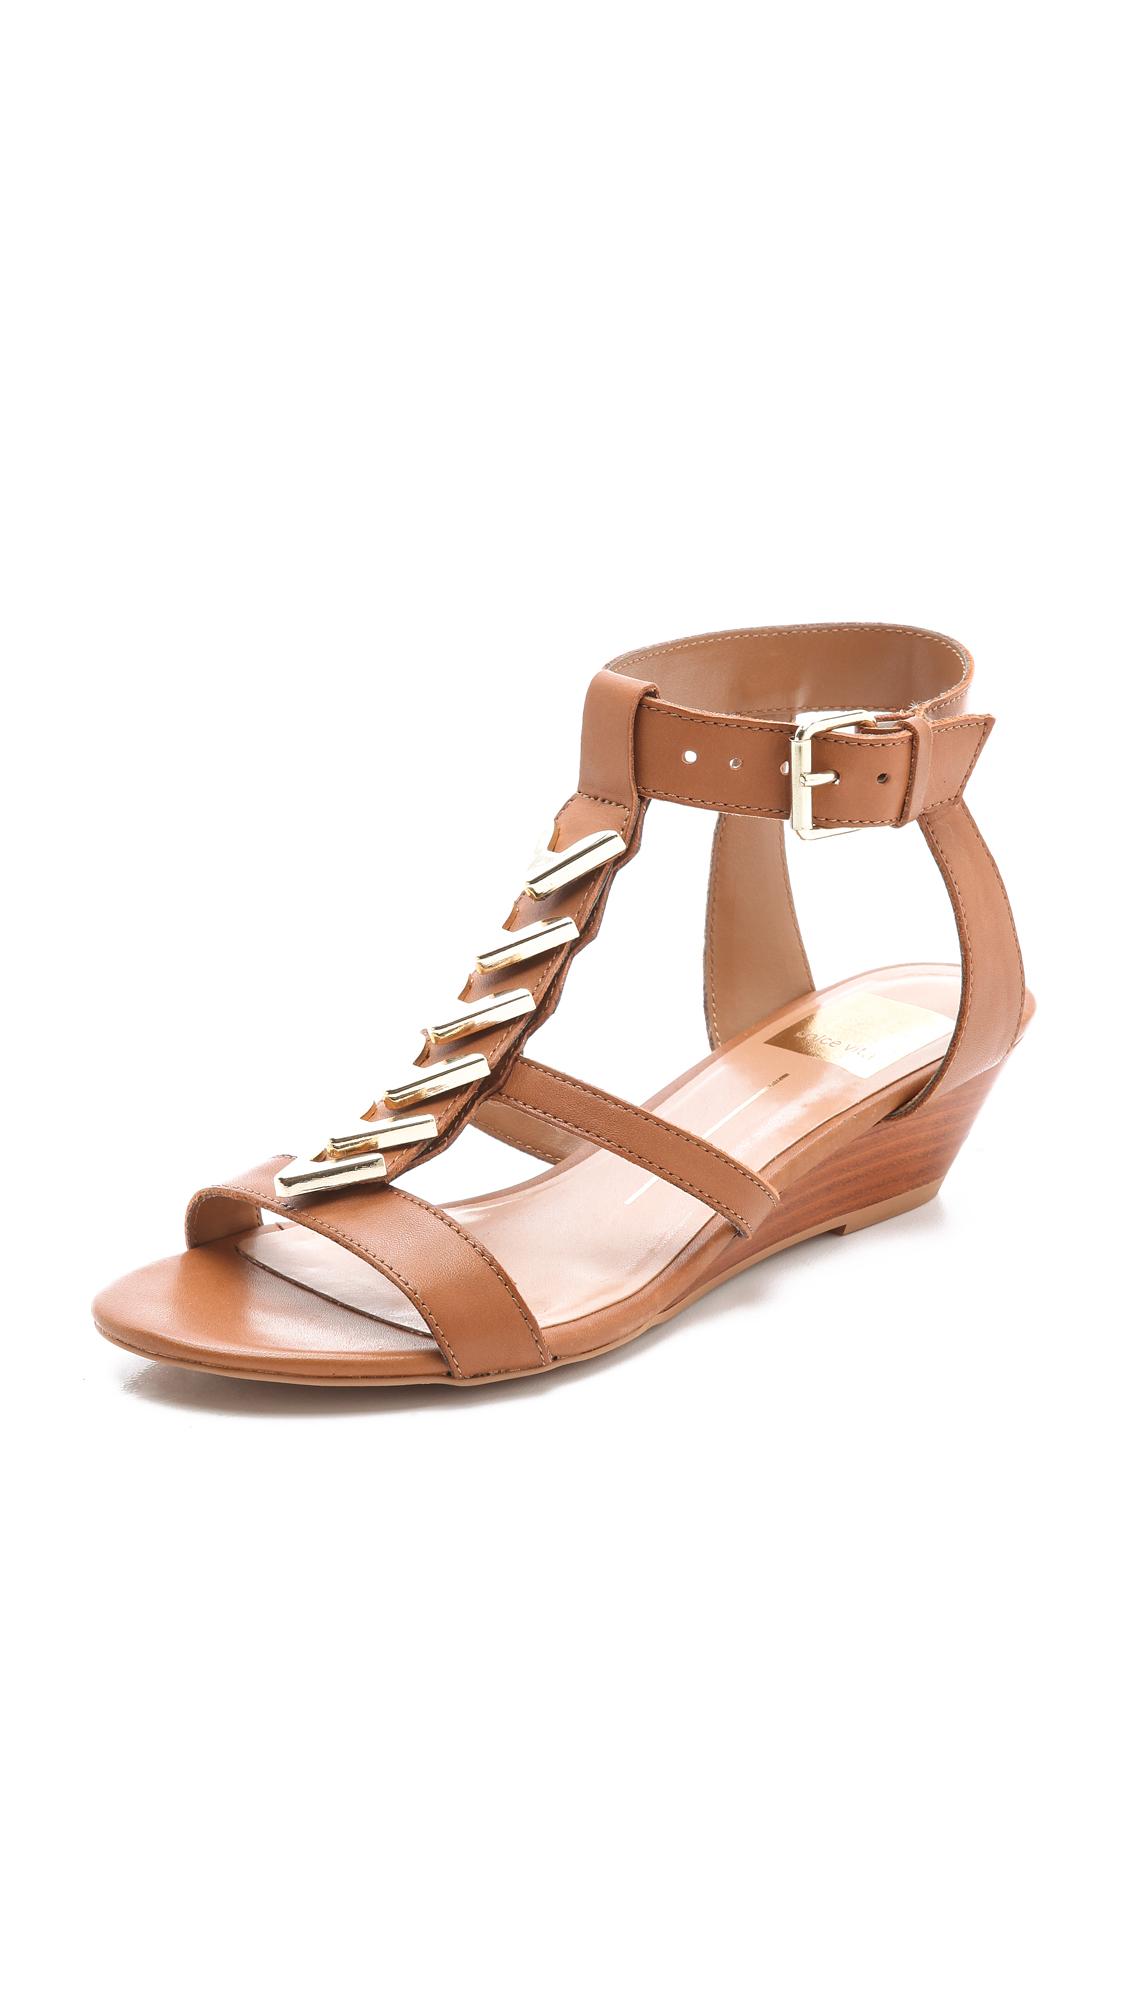 dolce vita helia low wedge sandals in beige cognac lyst